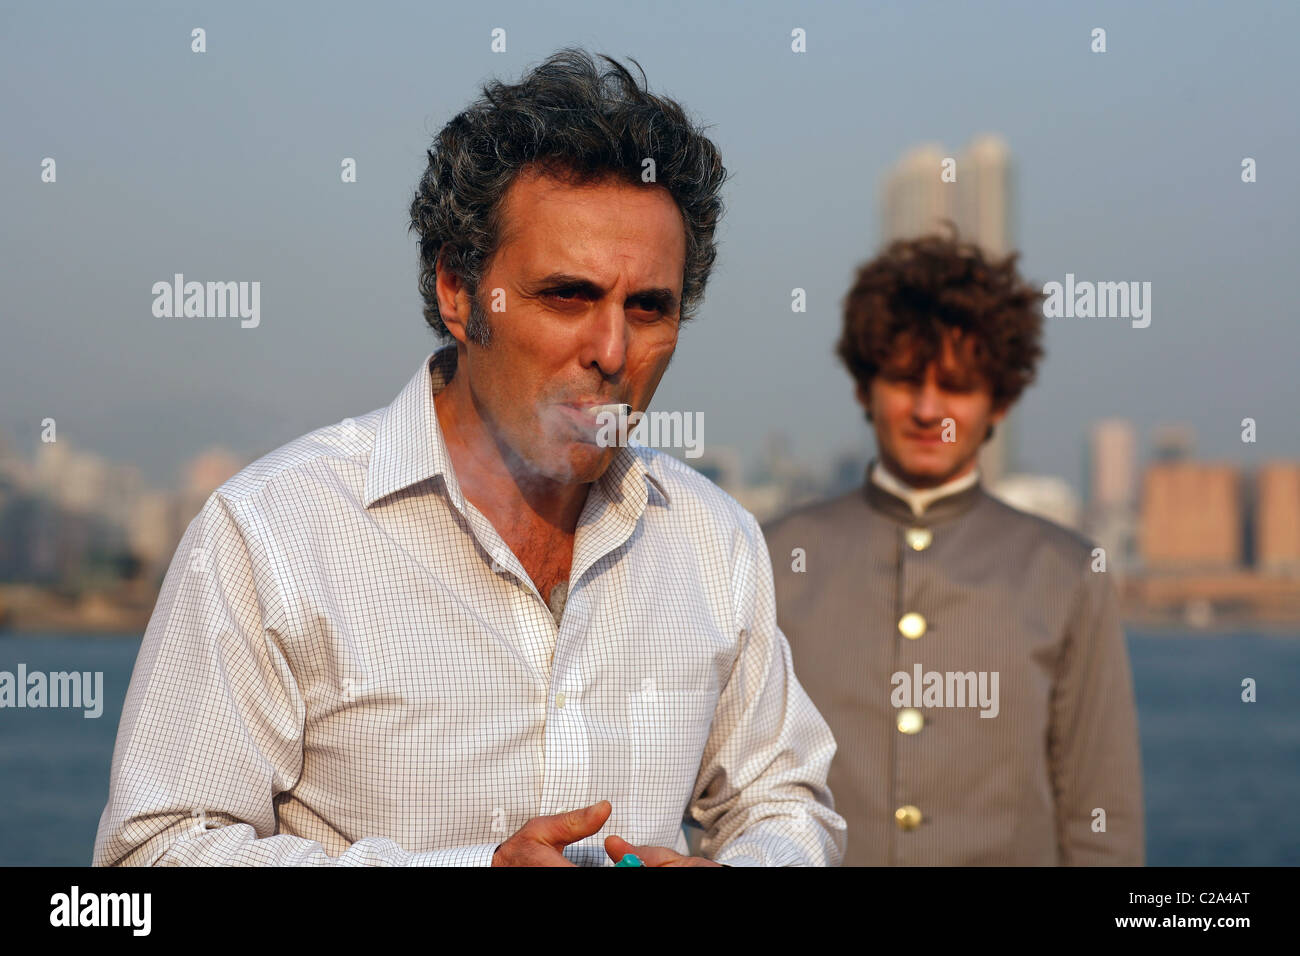 LARGO WINCH (2008) JEROME SALLE (DIR) 003 MOVIESTORE COLLECTION LTD - Stock Image